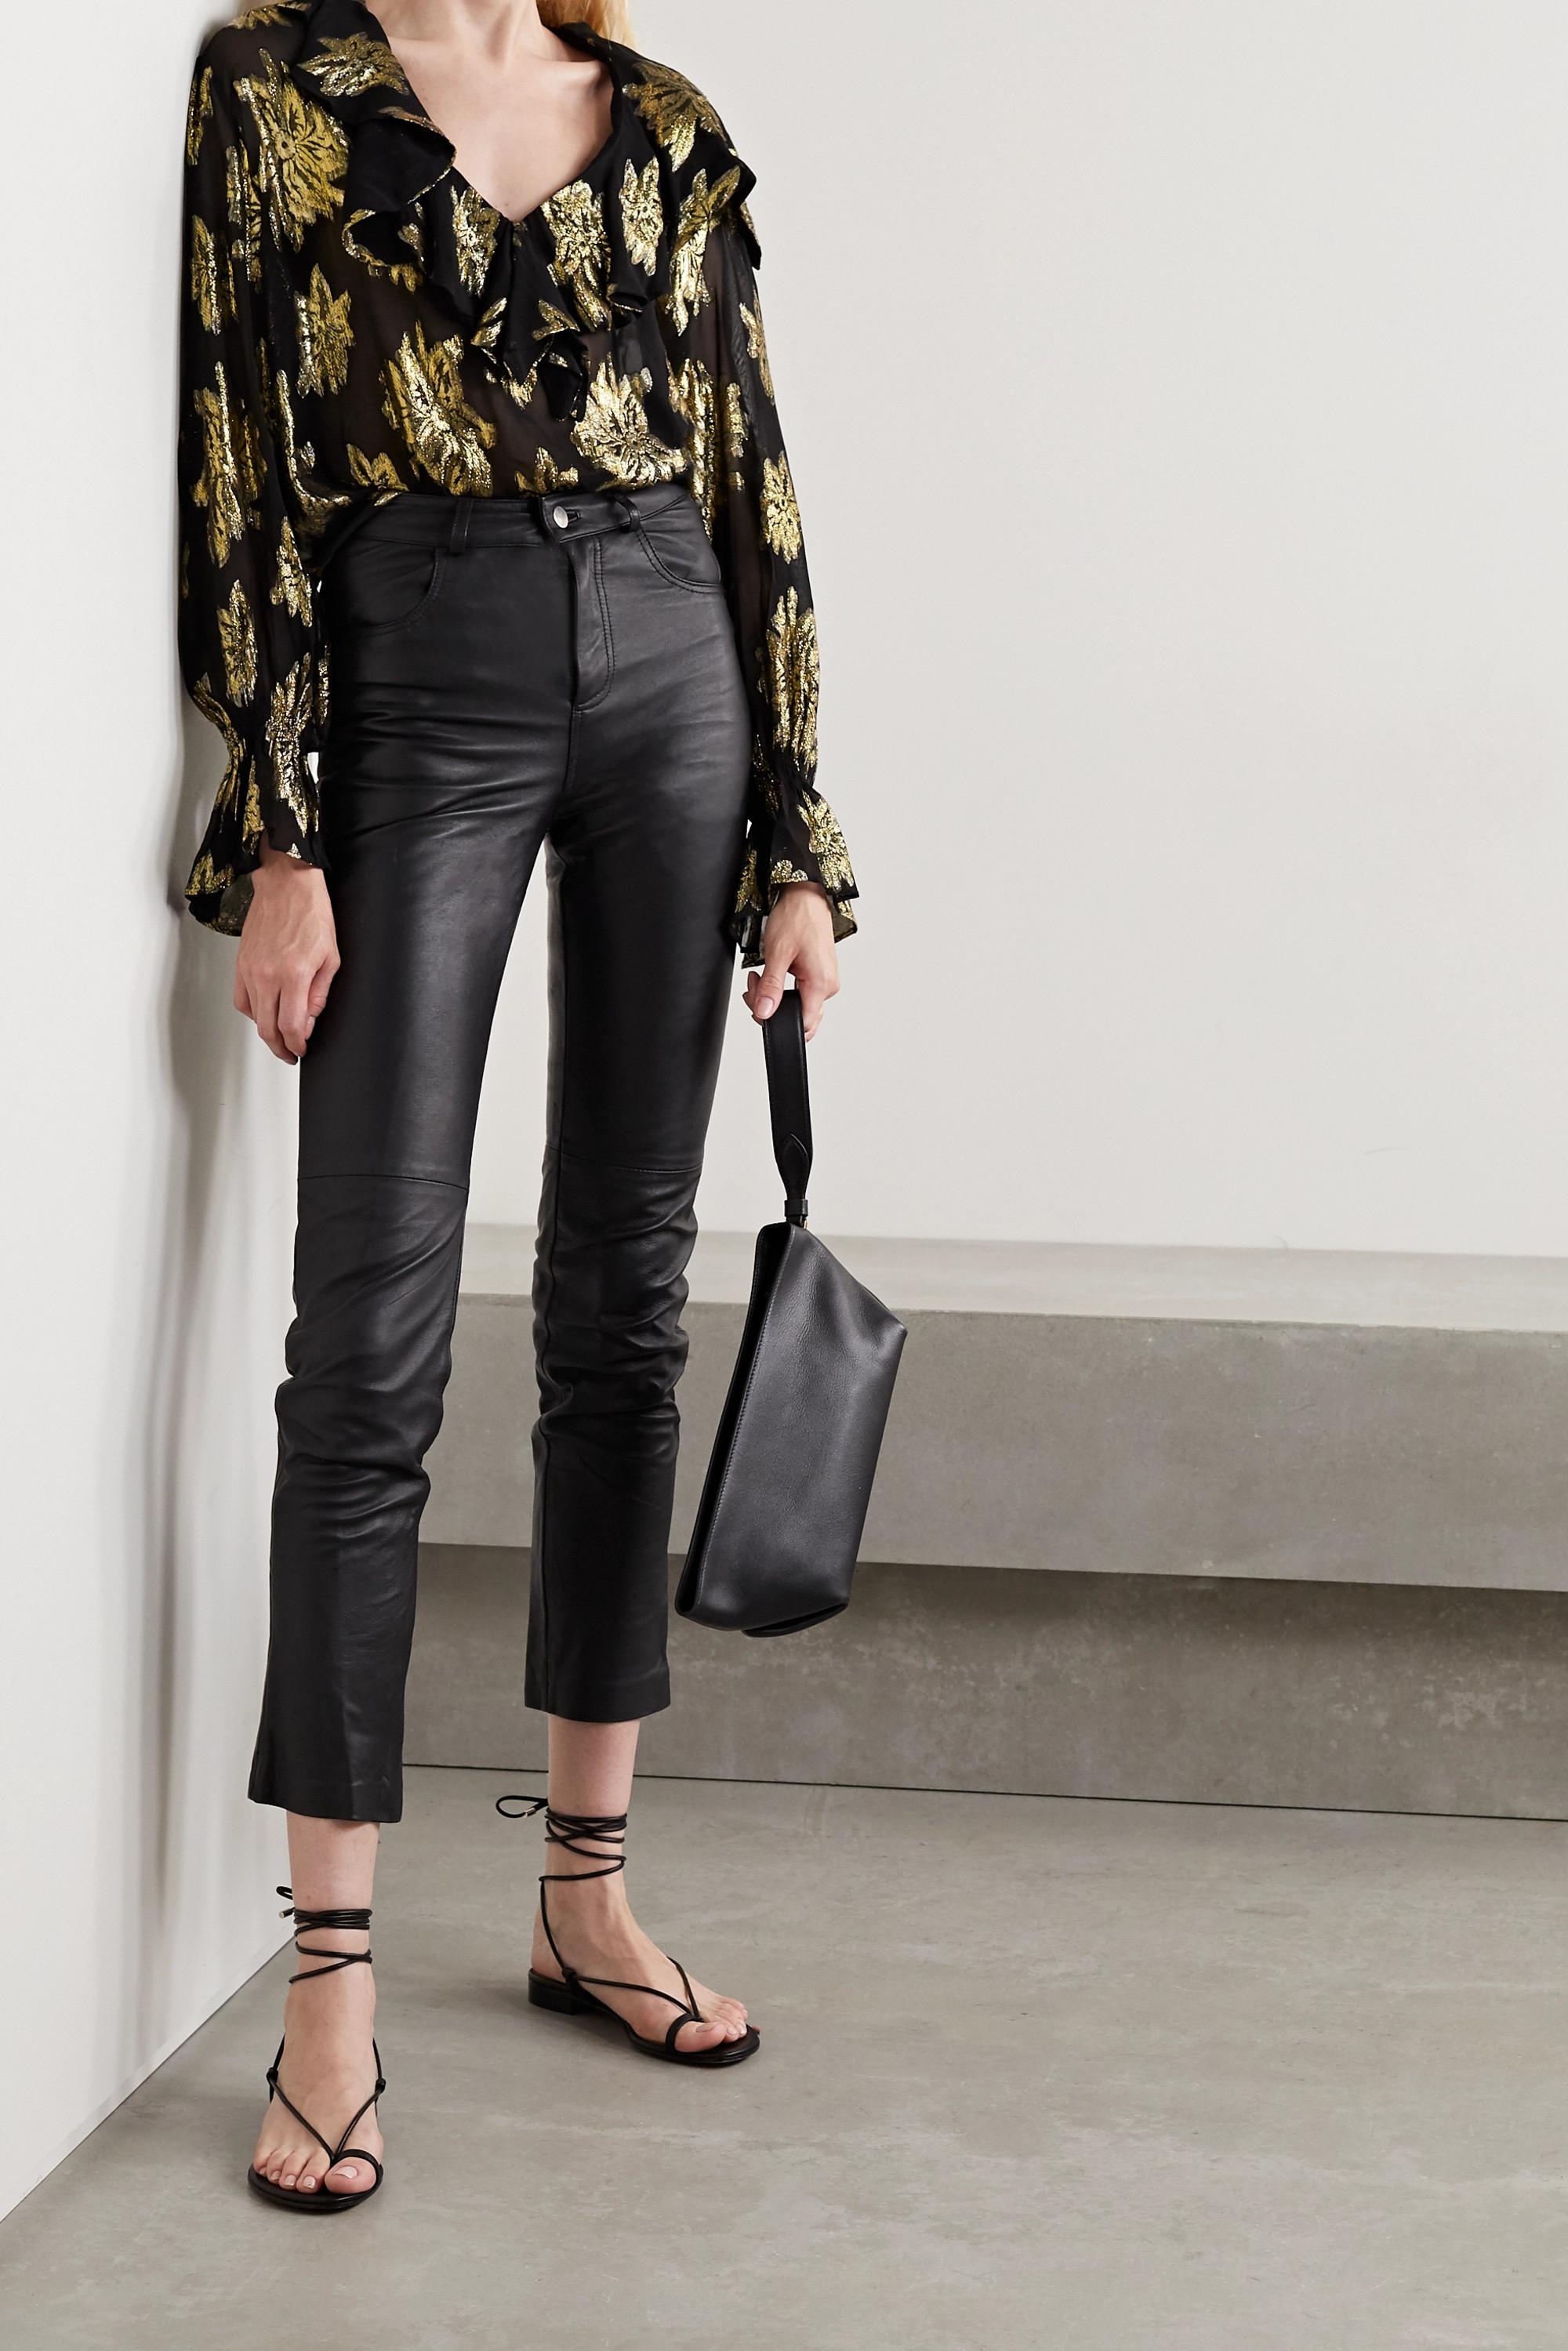 IRO Dresses Labra ruffled metallic fil coupé chiffon blouse